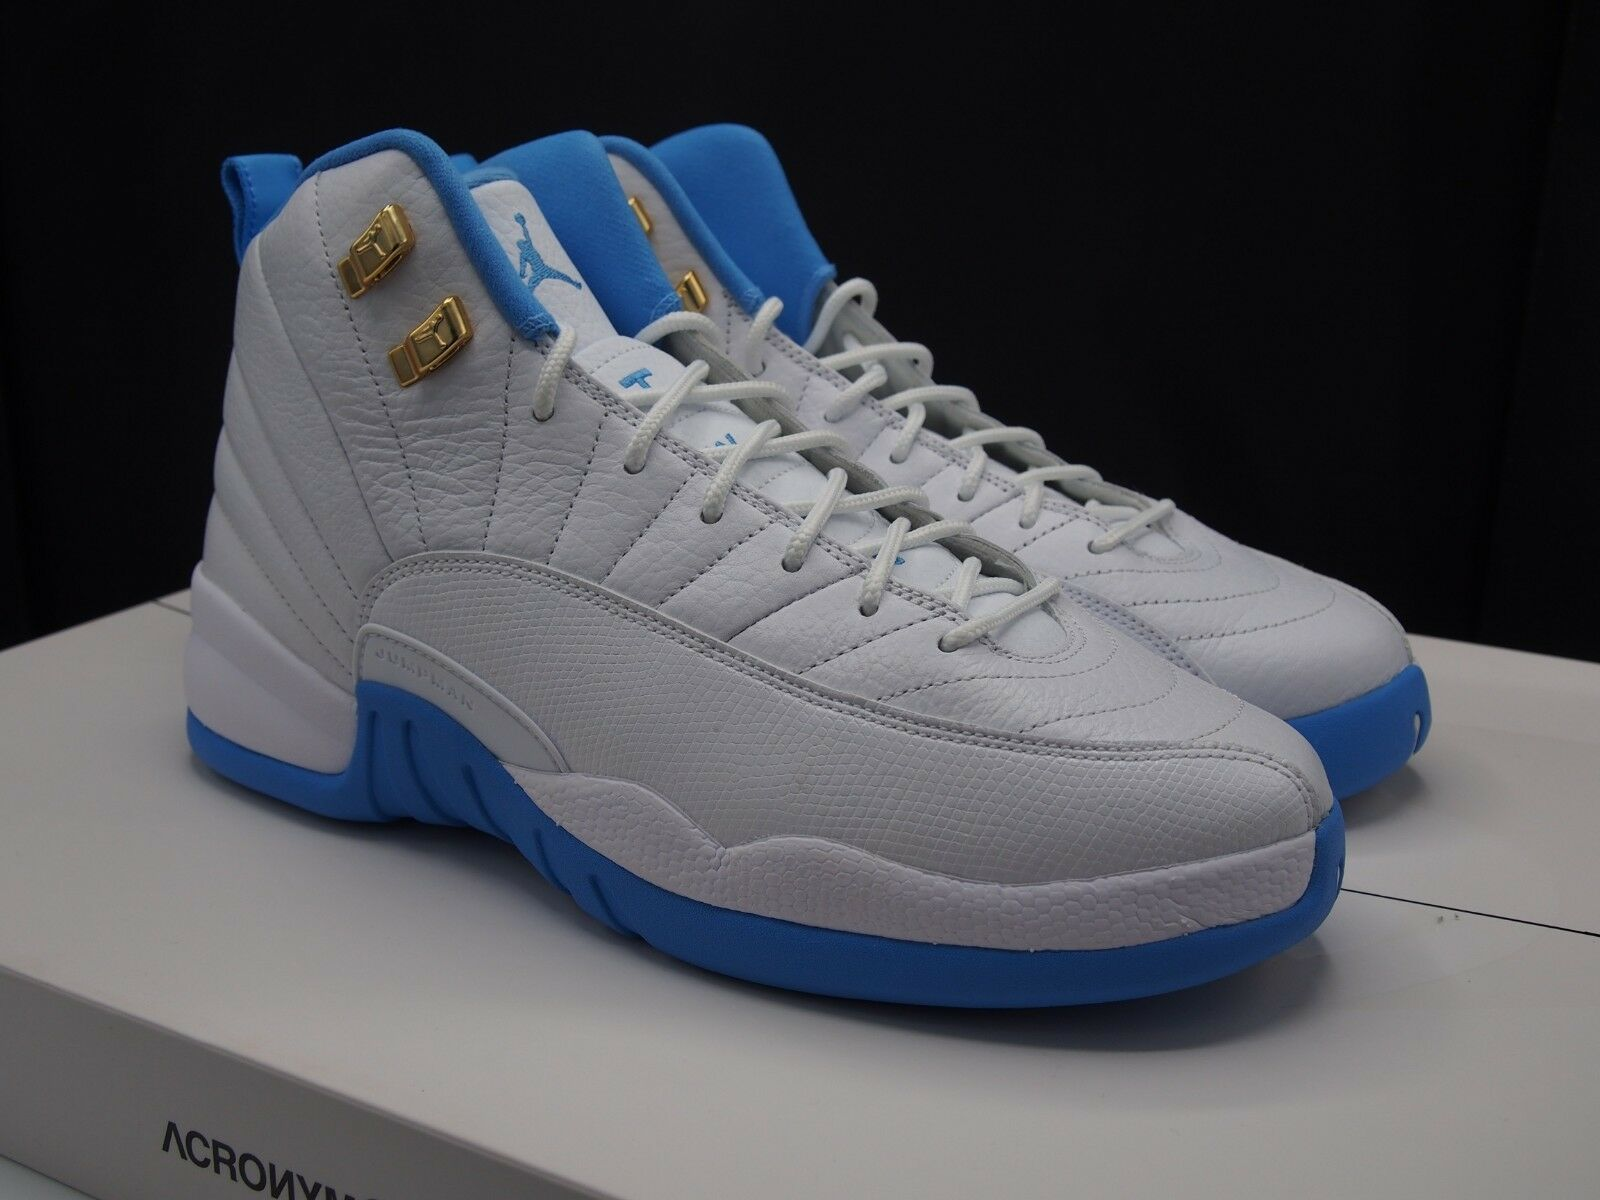 Nike Air Jordan XII 12 Retro  Melo  University bluee size 9.5 US